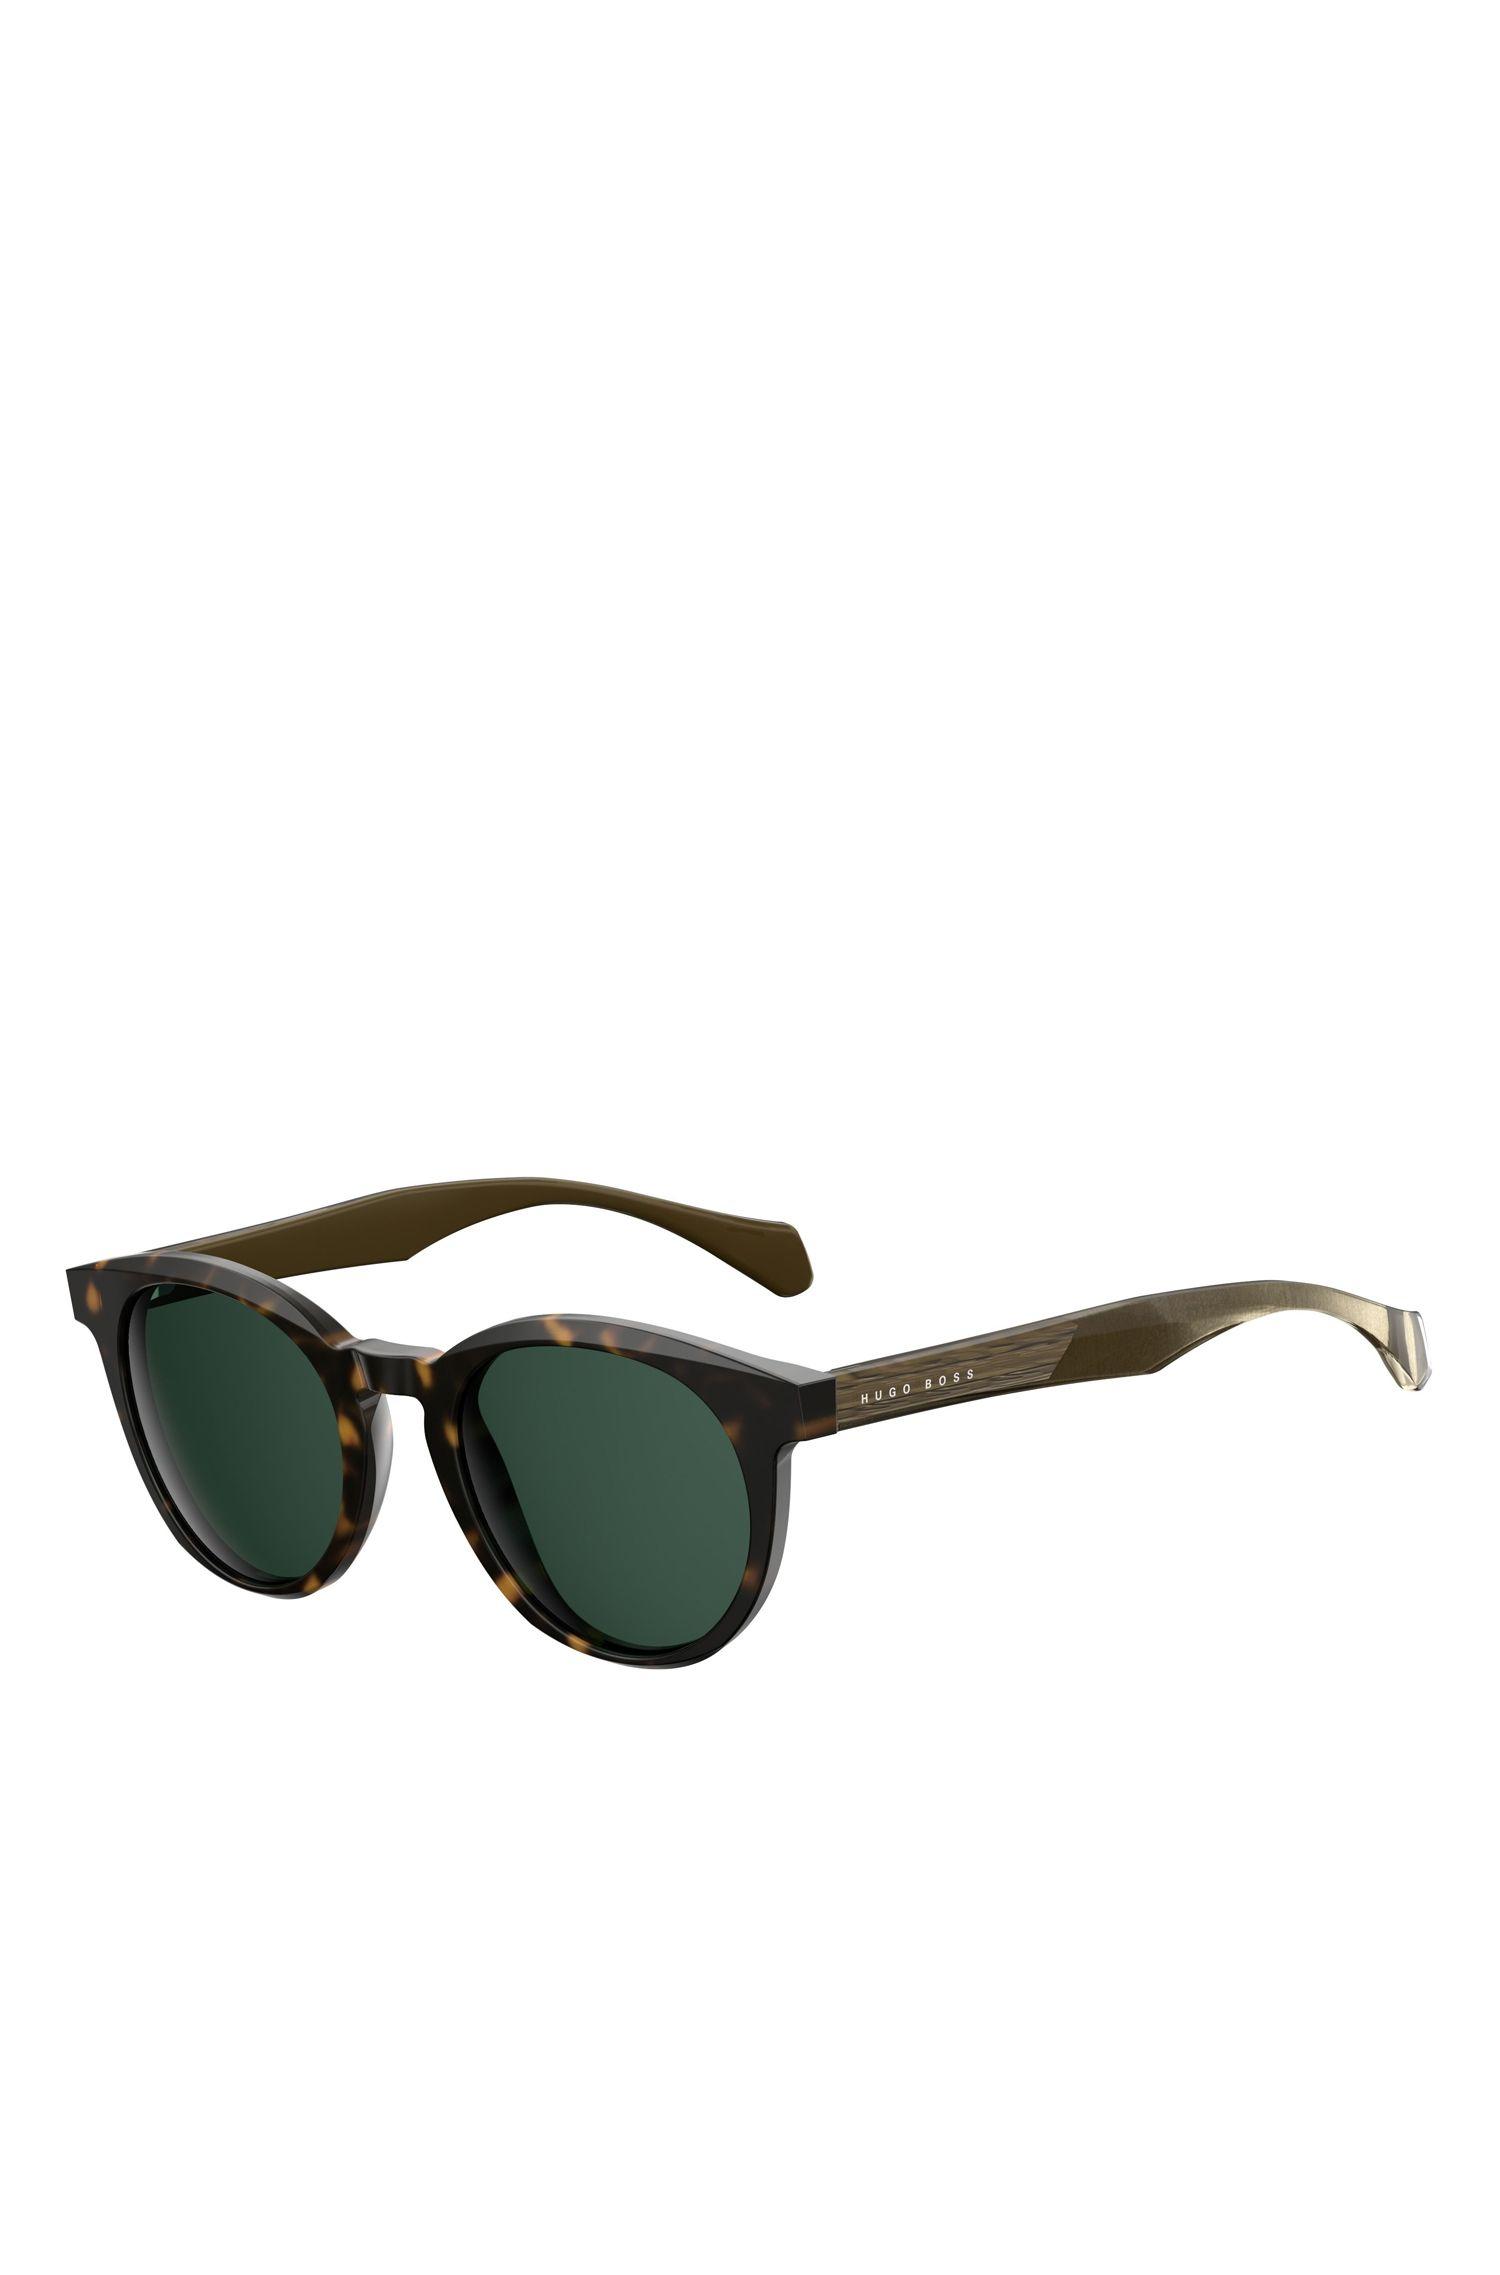 'BOSS 0912/S' | Black Acetate Round Sunglasses